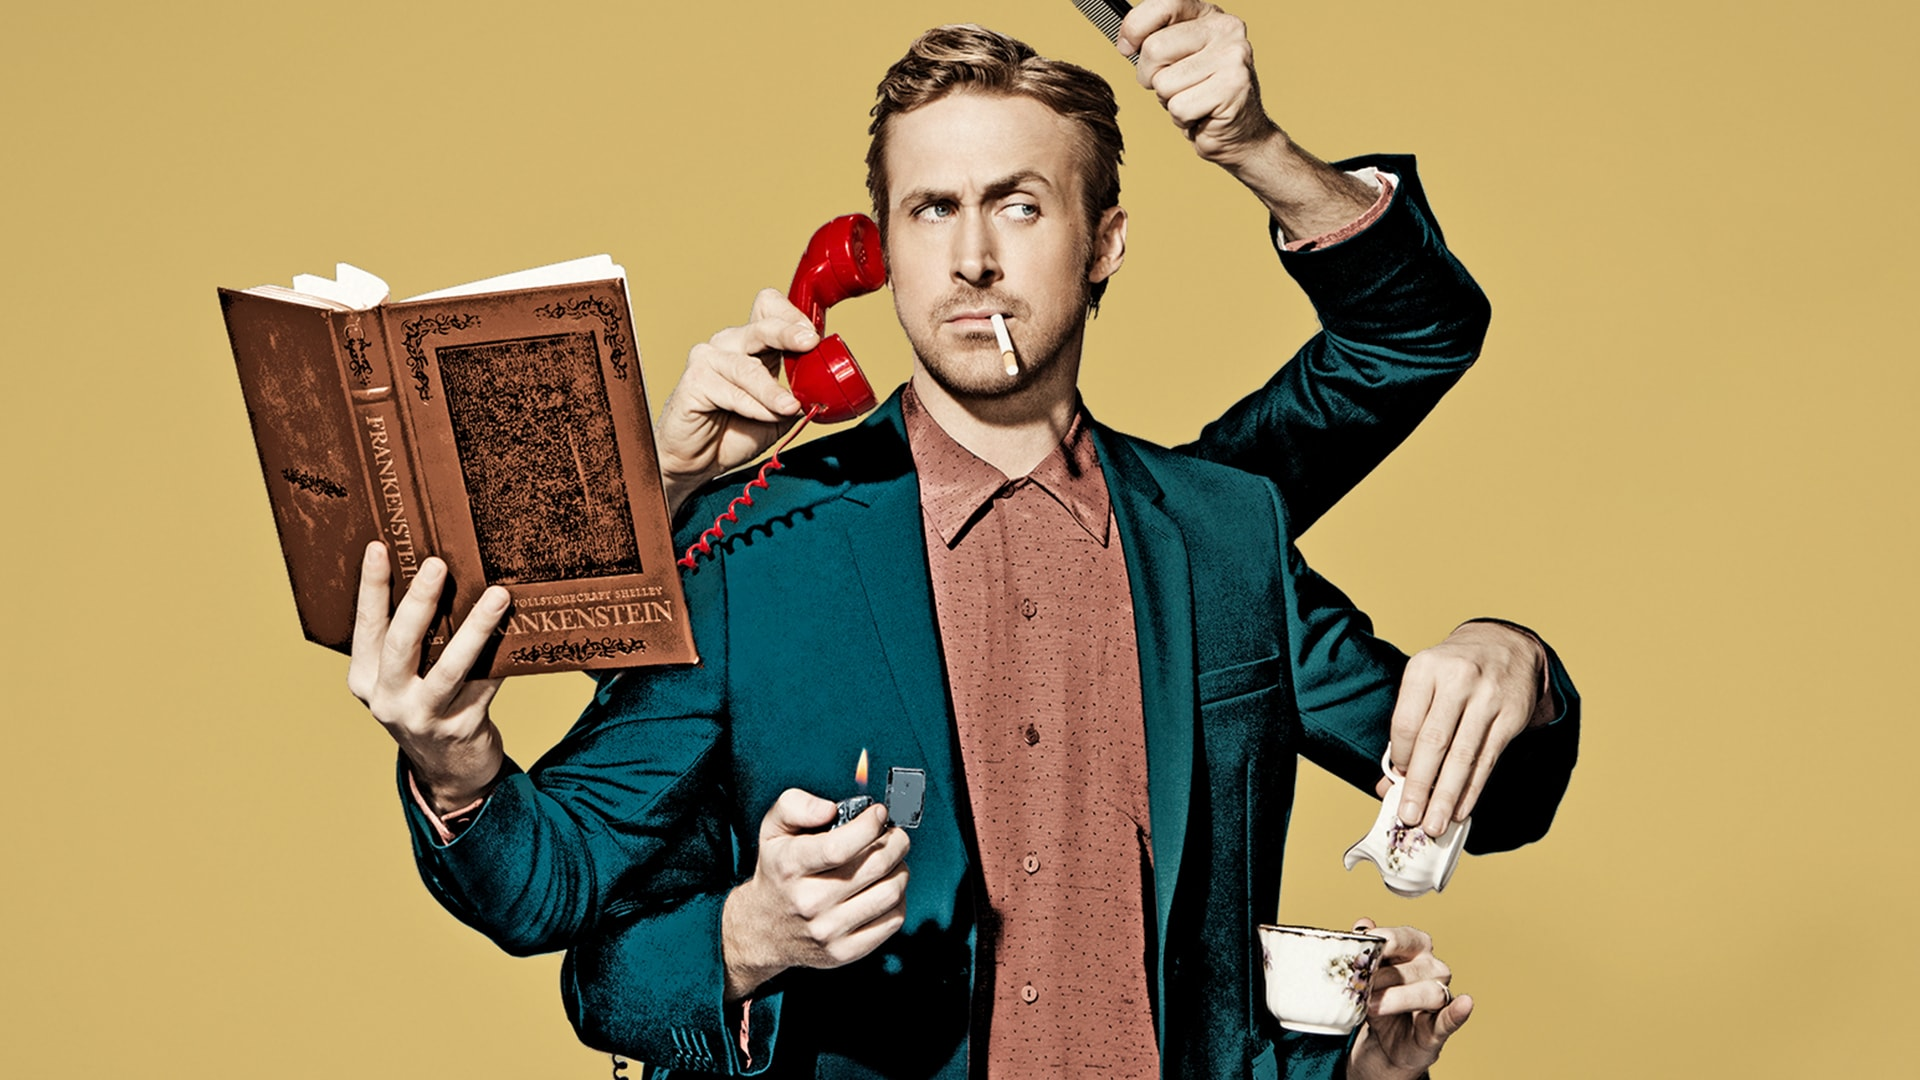 Ryan Gosling: December 5, 2015